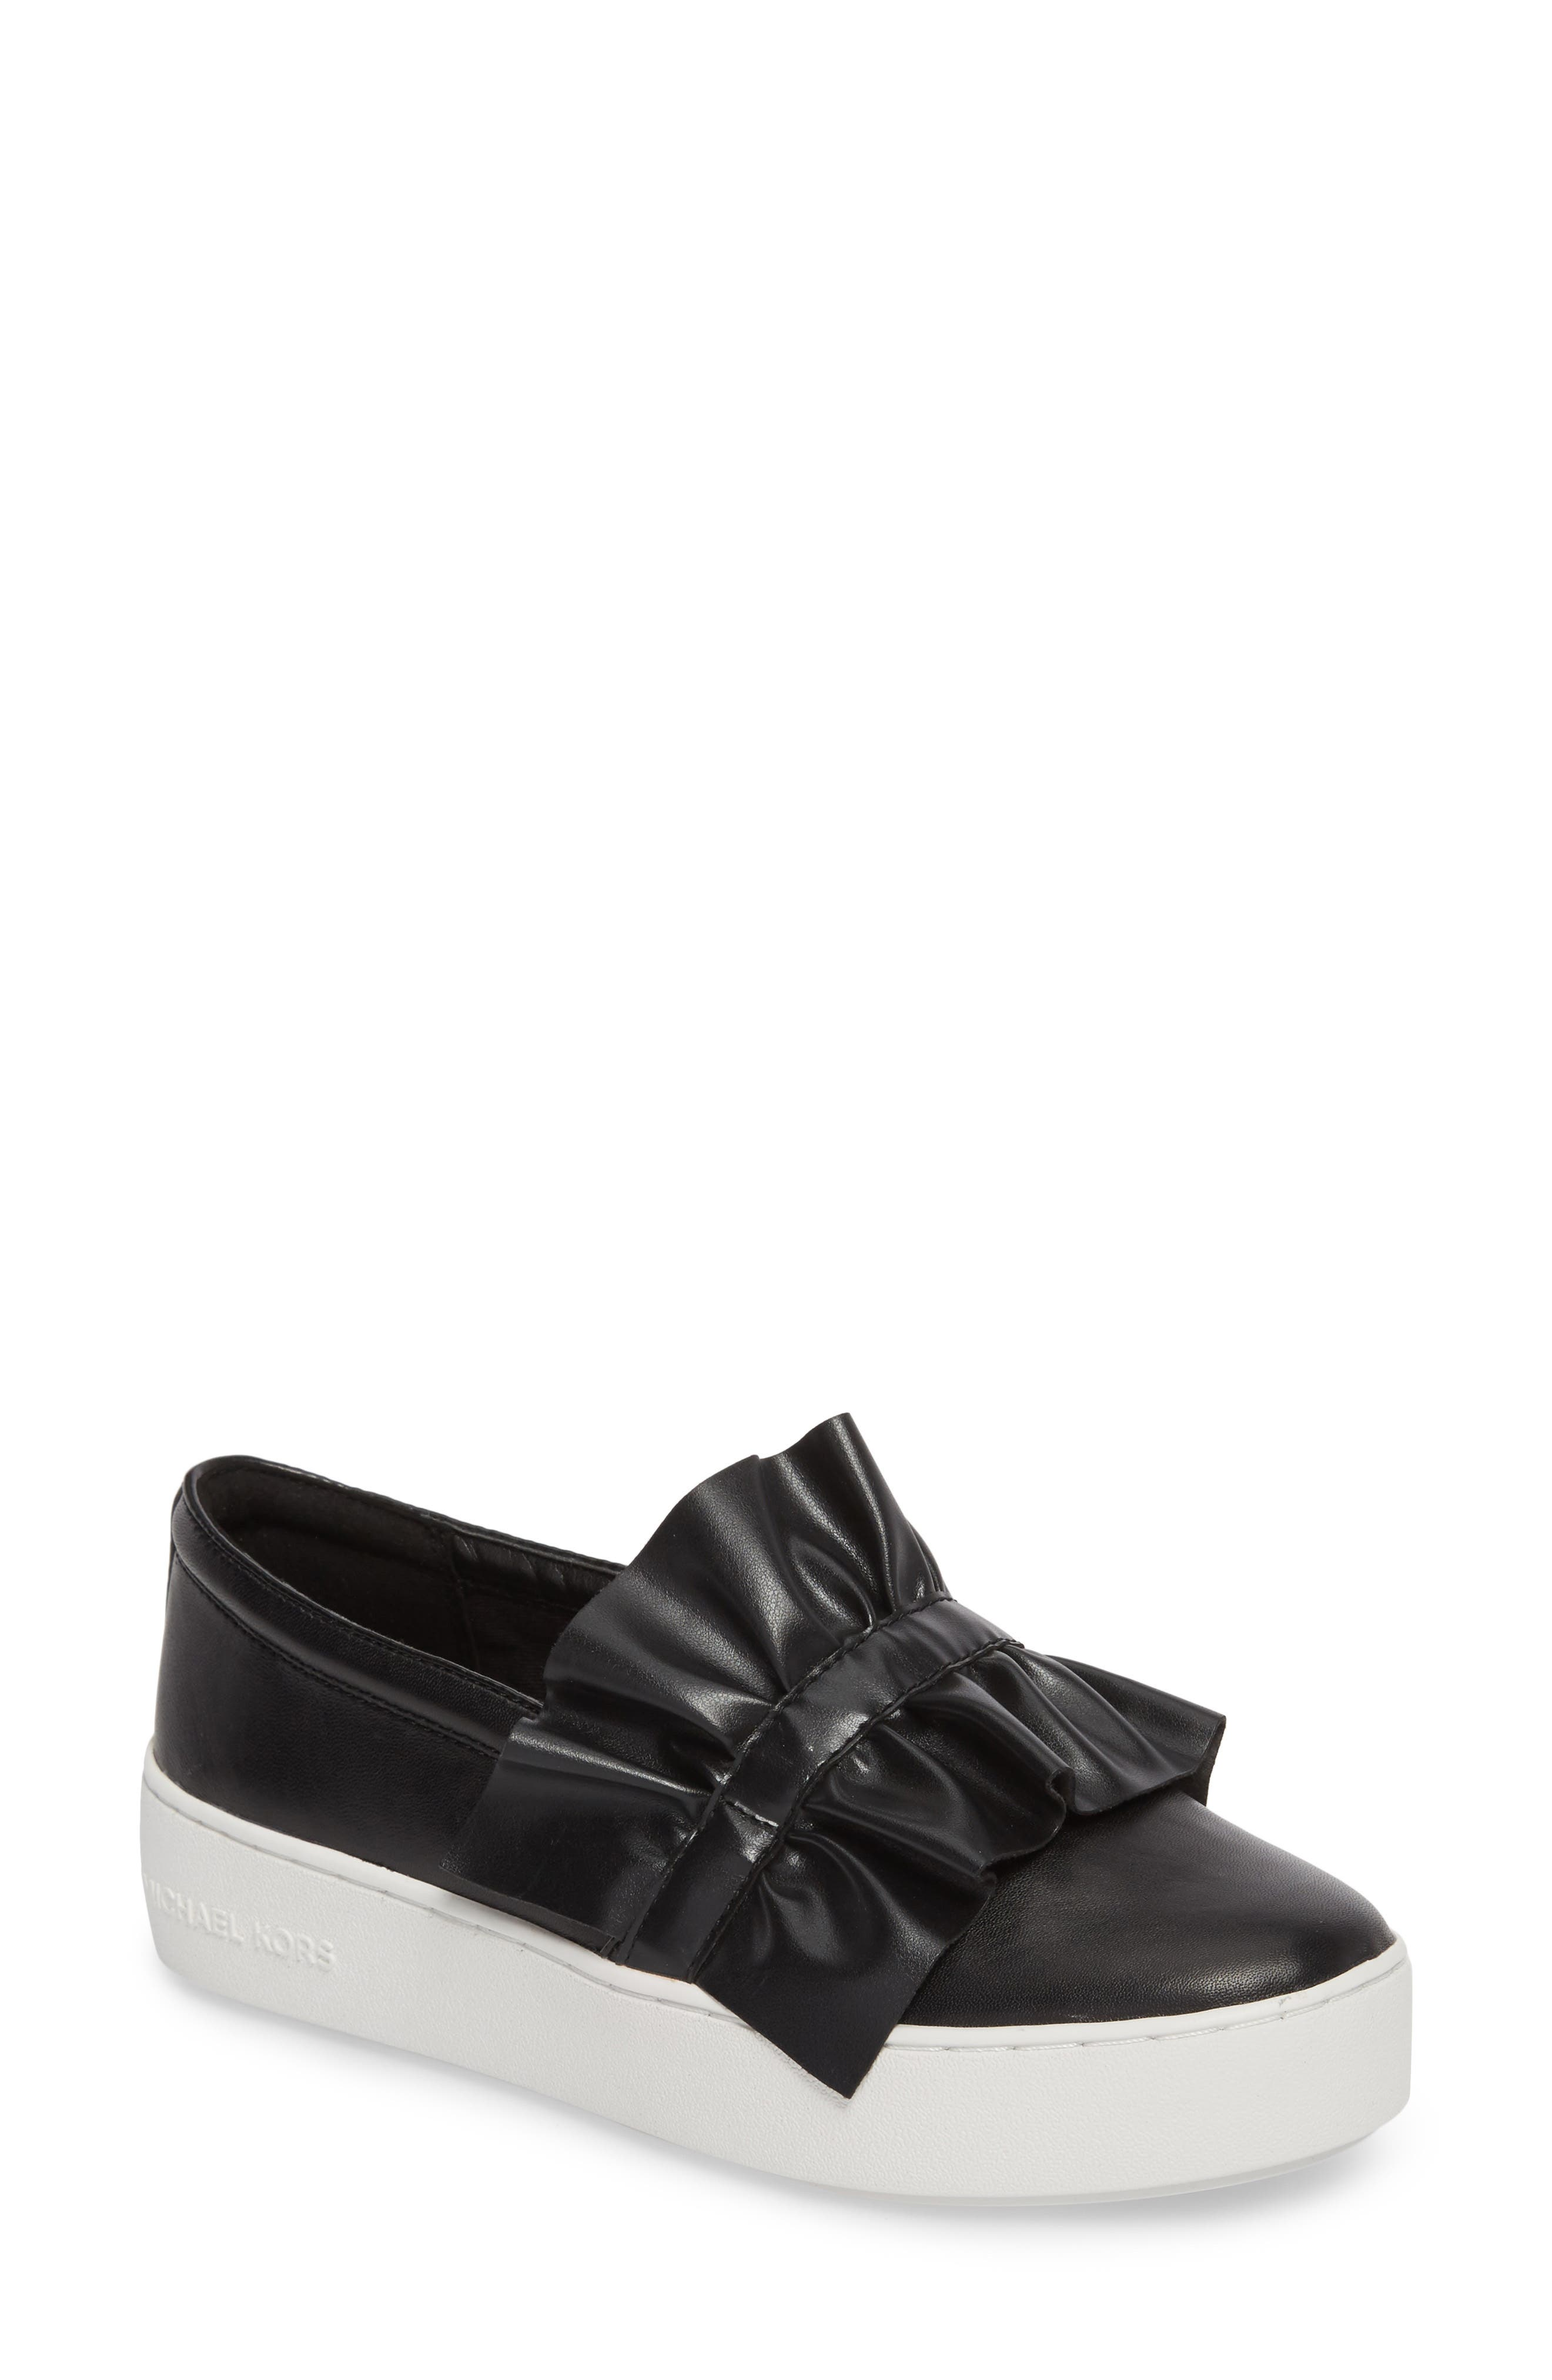 Alternate Image 1 Selected - MICHAEL Michael Kors Bella Slip-On Sneaker (Women)